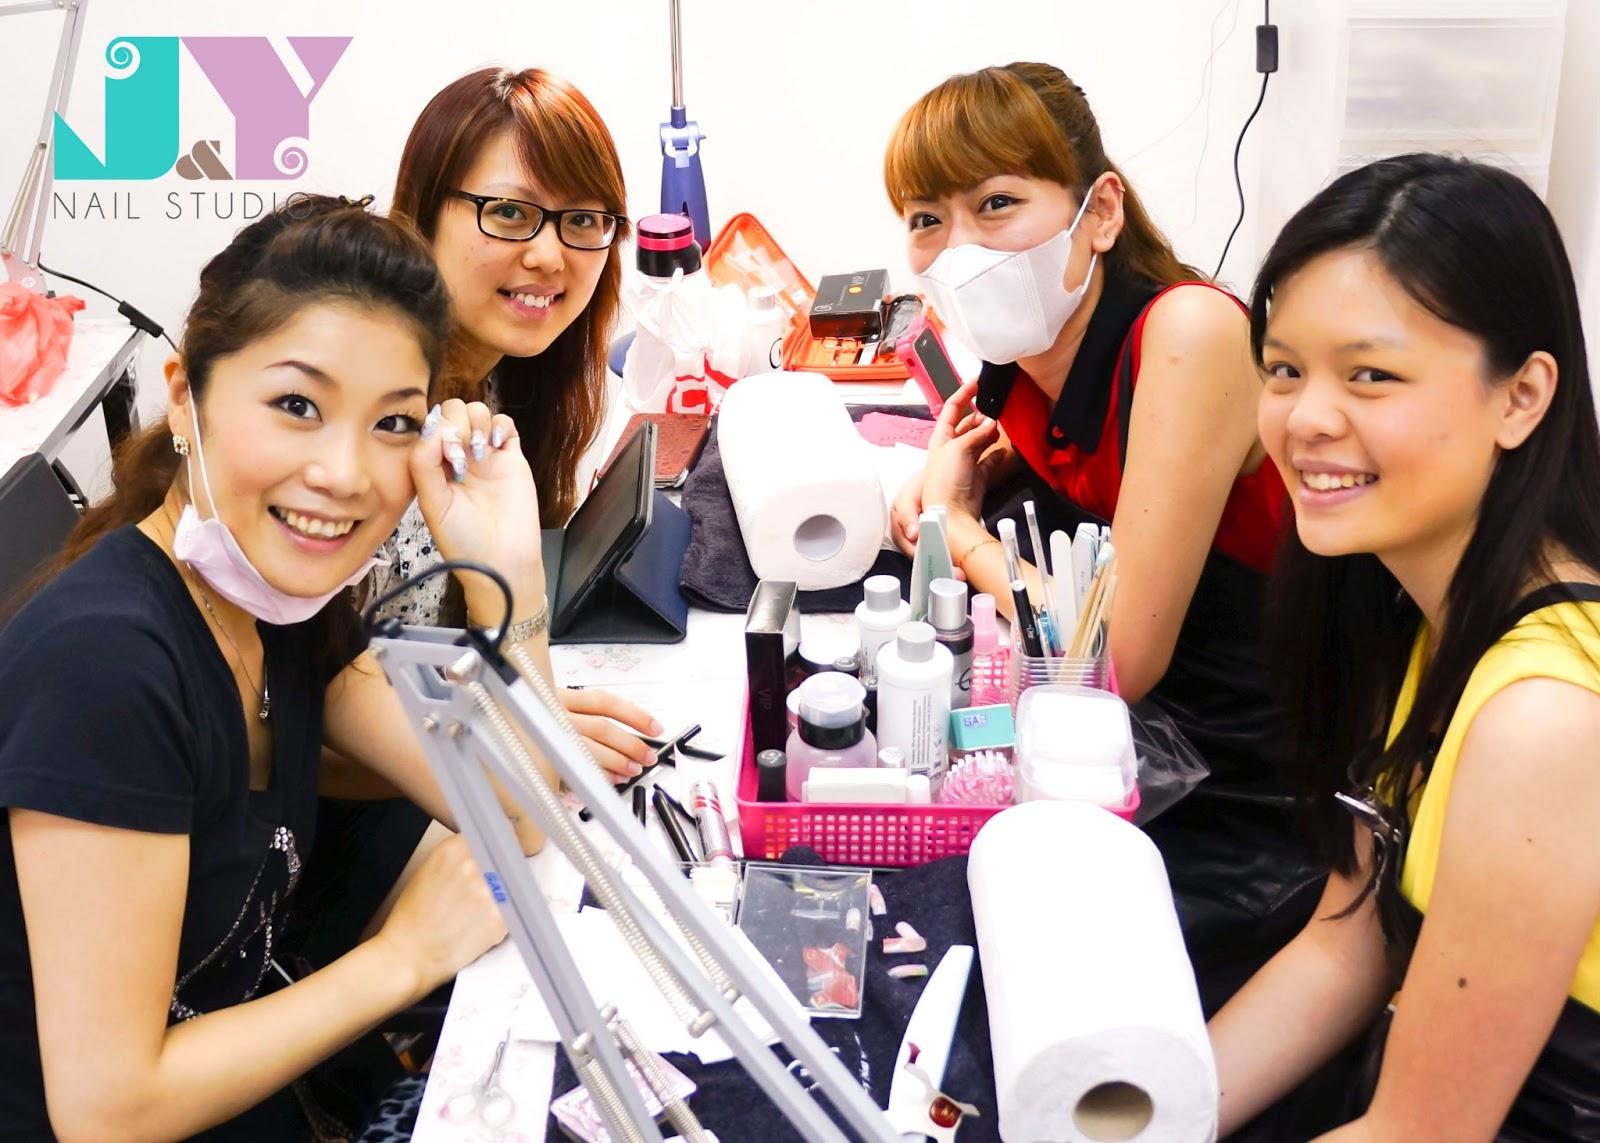 J Nail Studio Ons Professional Full Nail Course Singapore